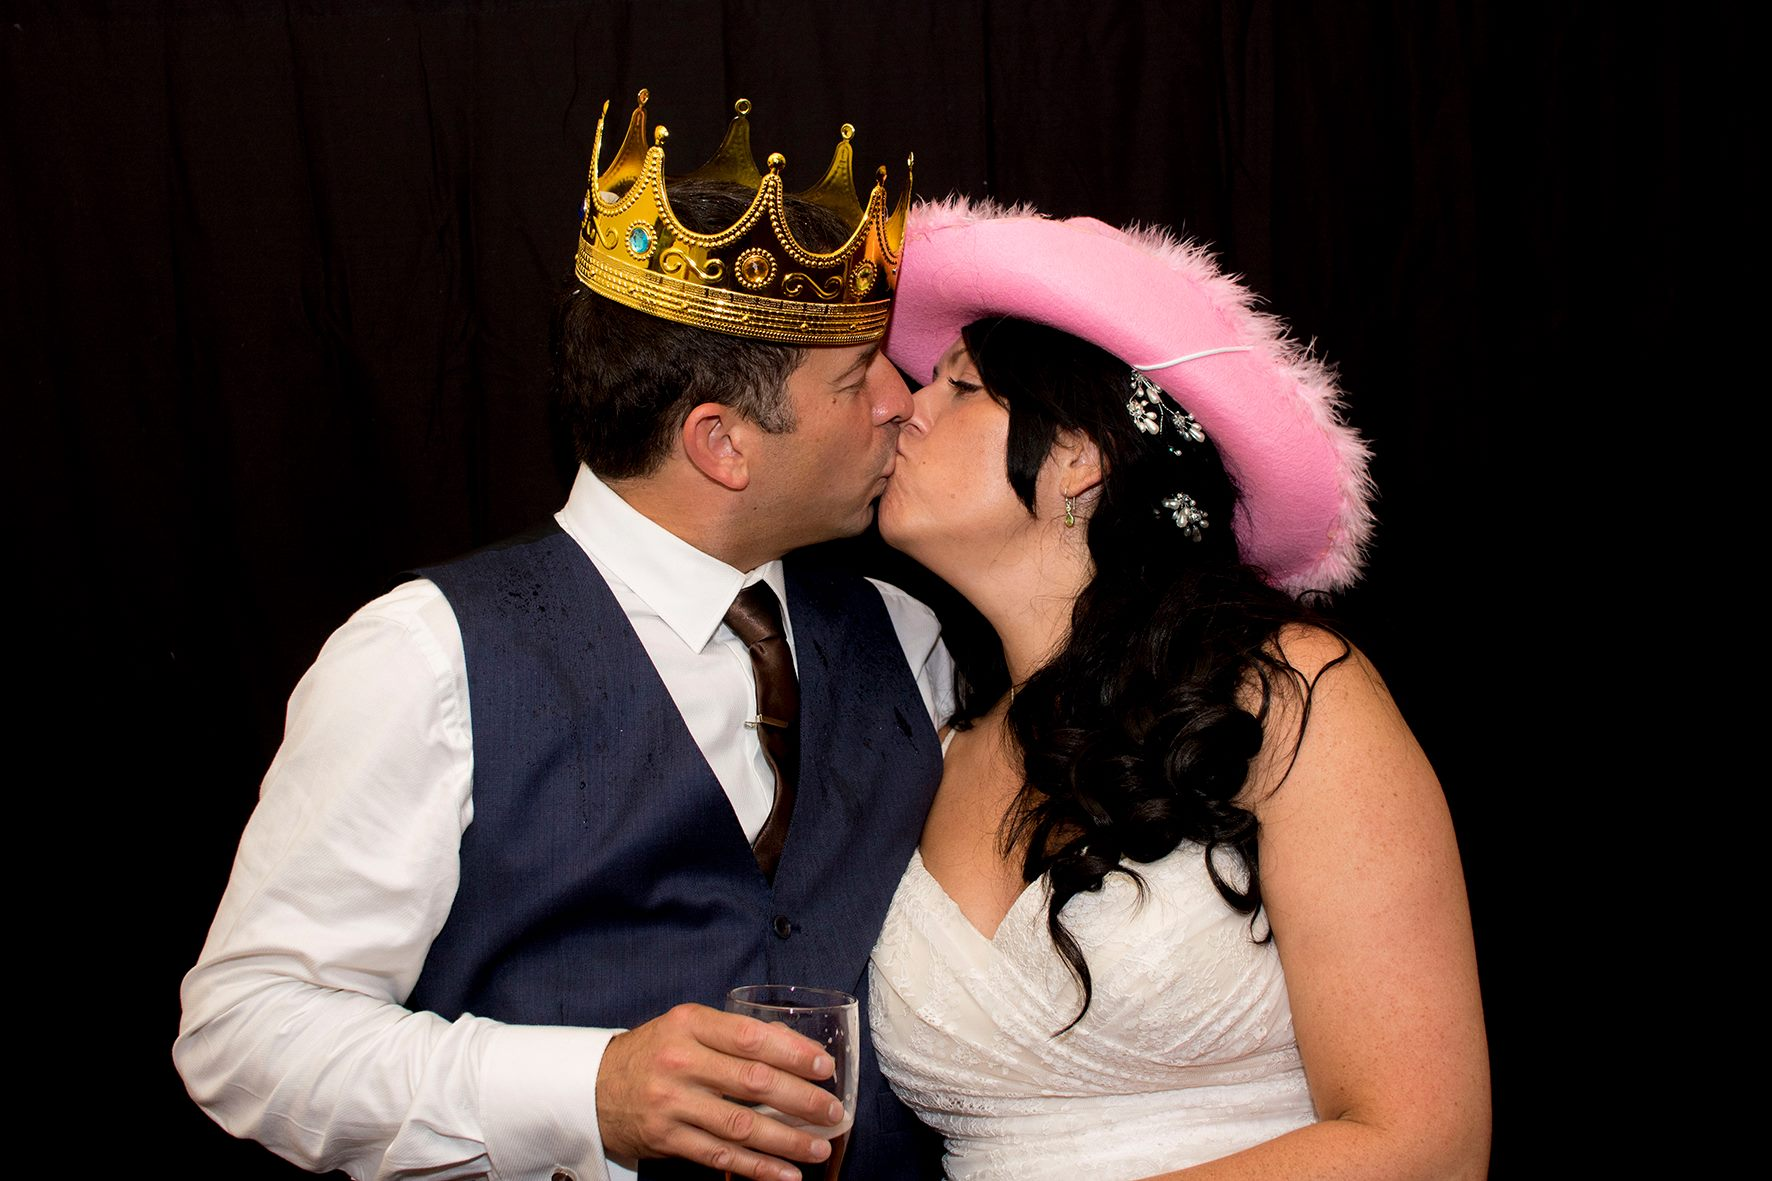 cornwall wedding disco dj photographer 36